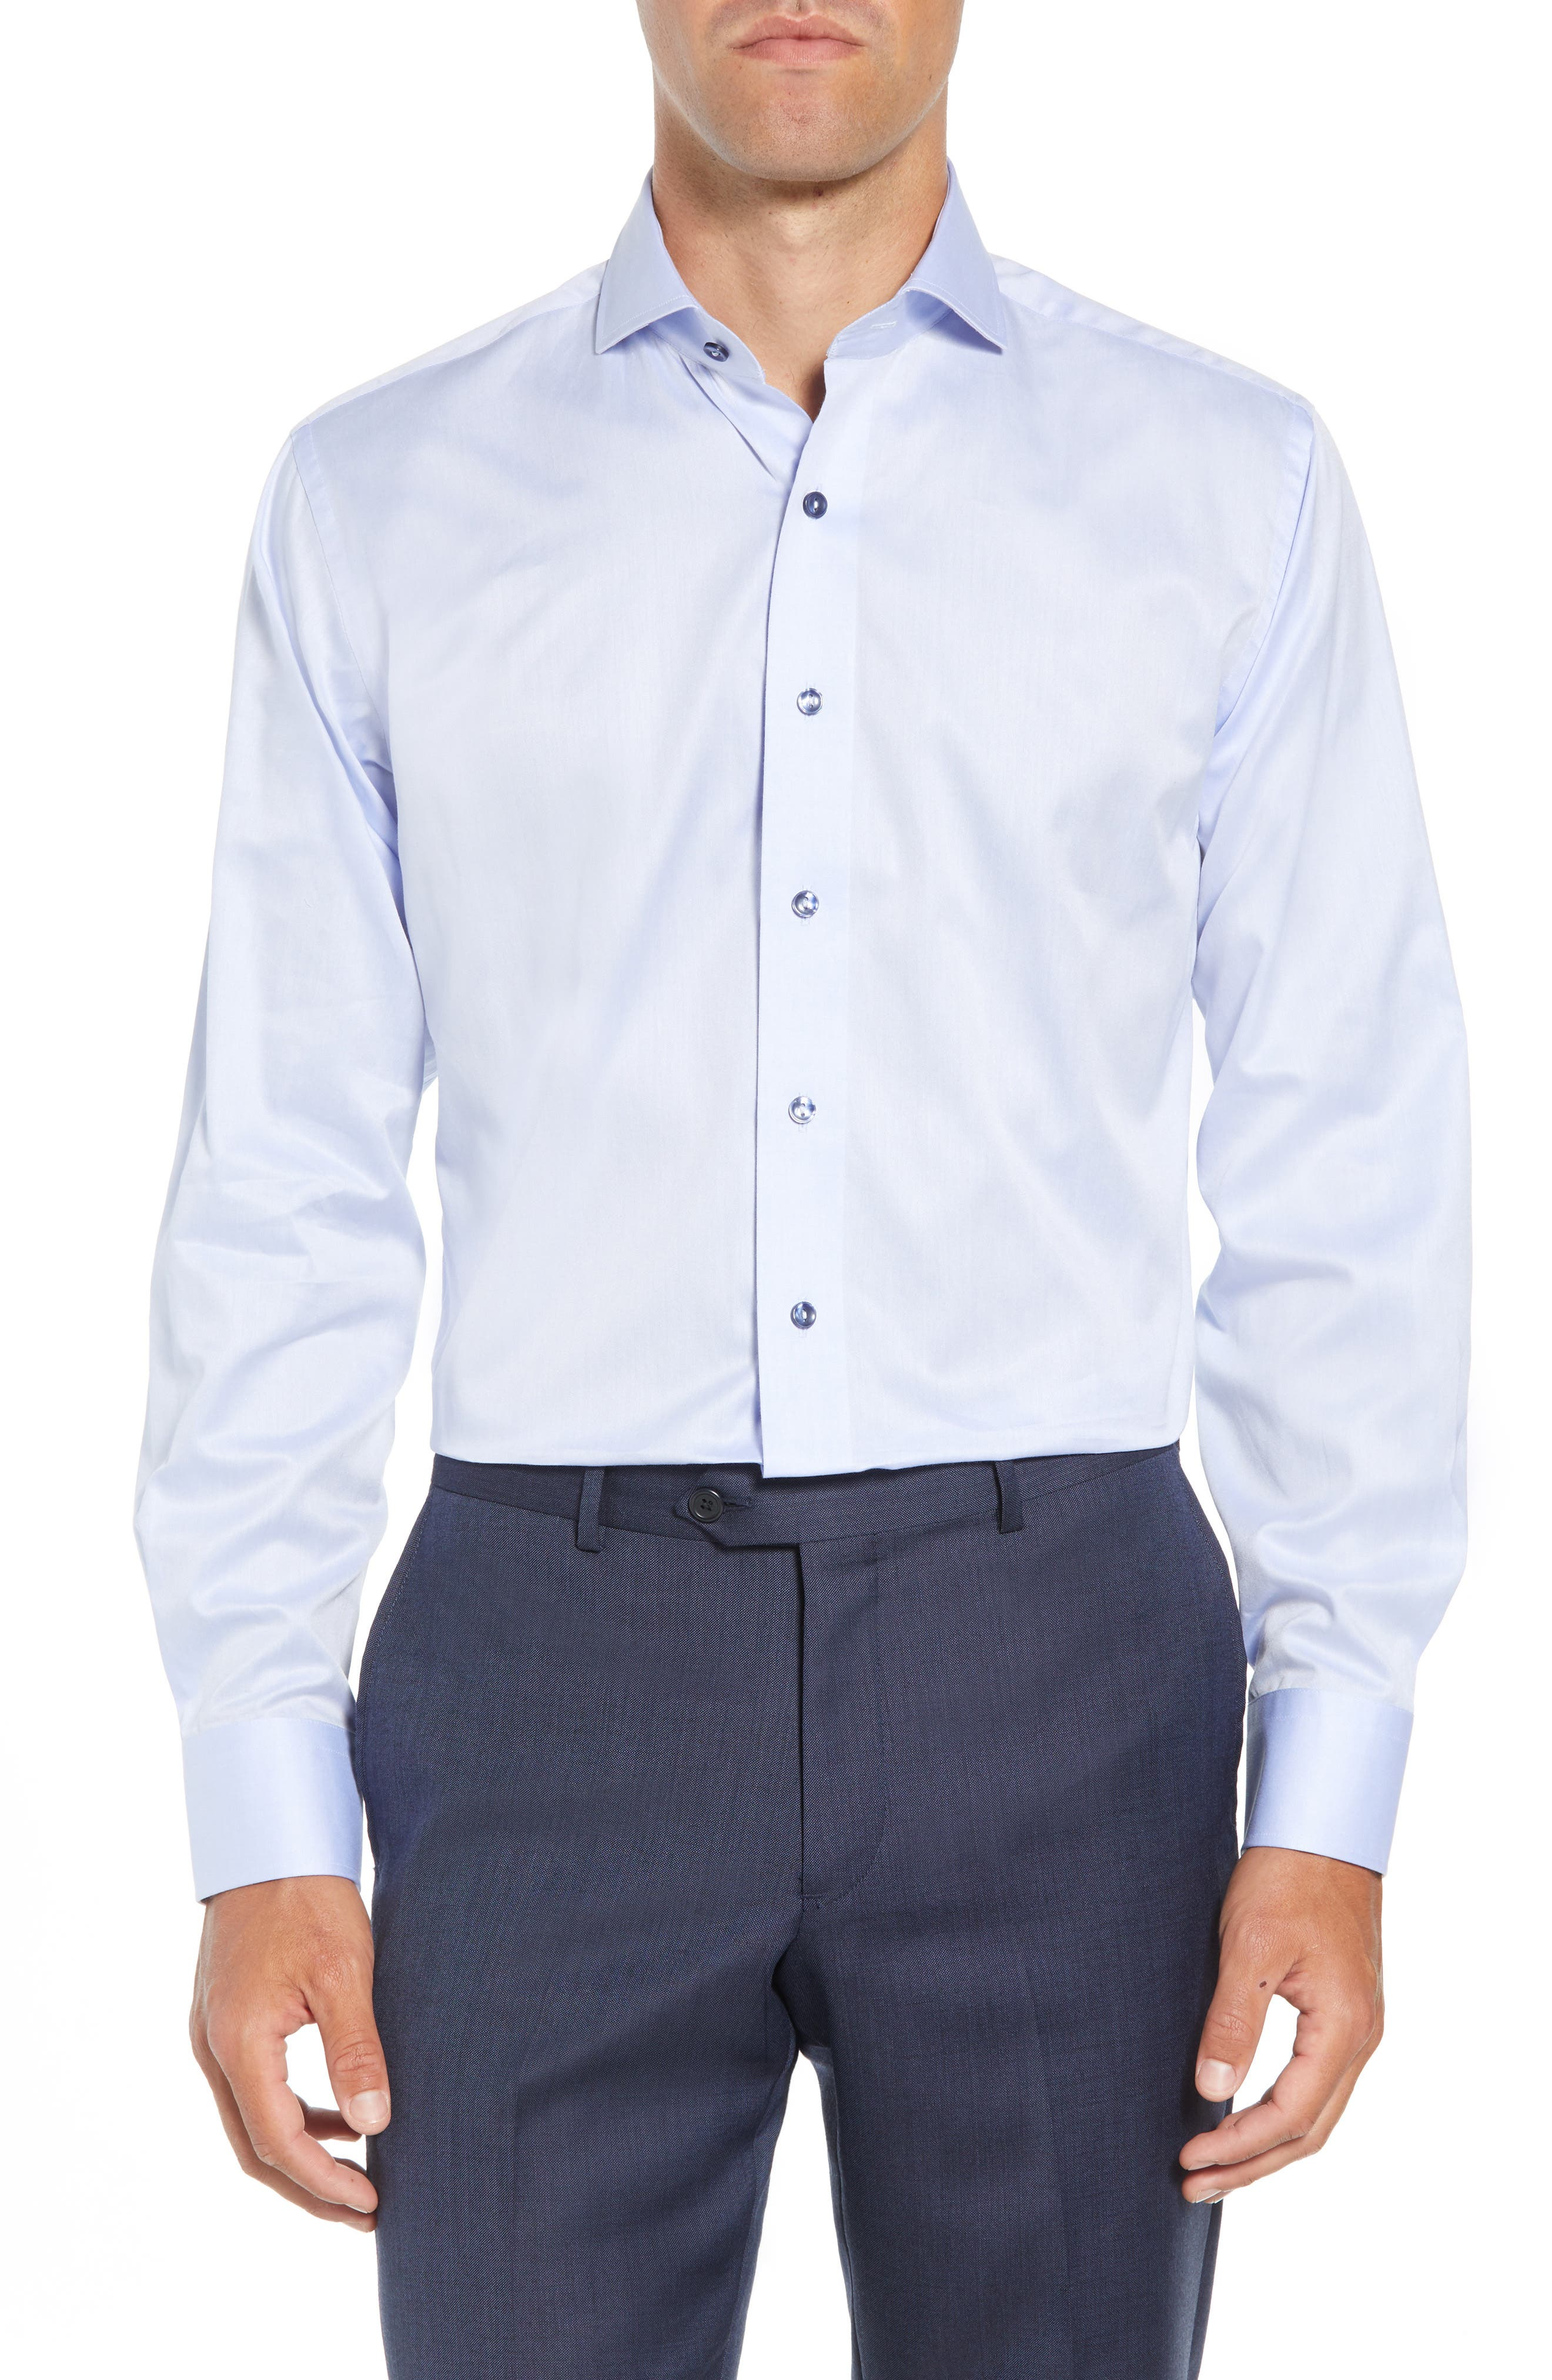 LORENZO UOMO,                             Trim Fit Solid Dress Shirt,                             Main thumbnail 1, color,                             LIGHT BLUE